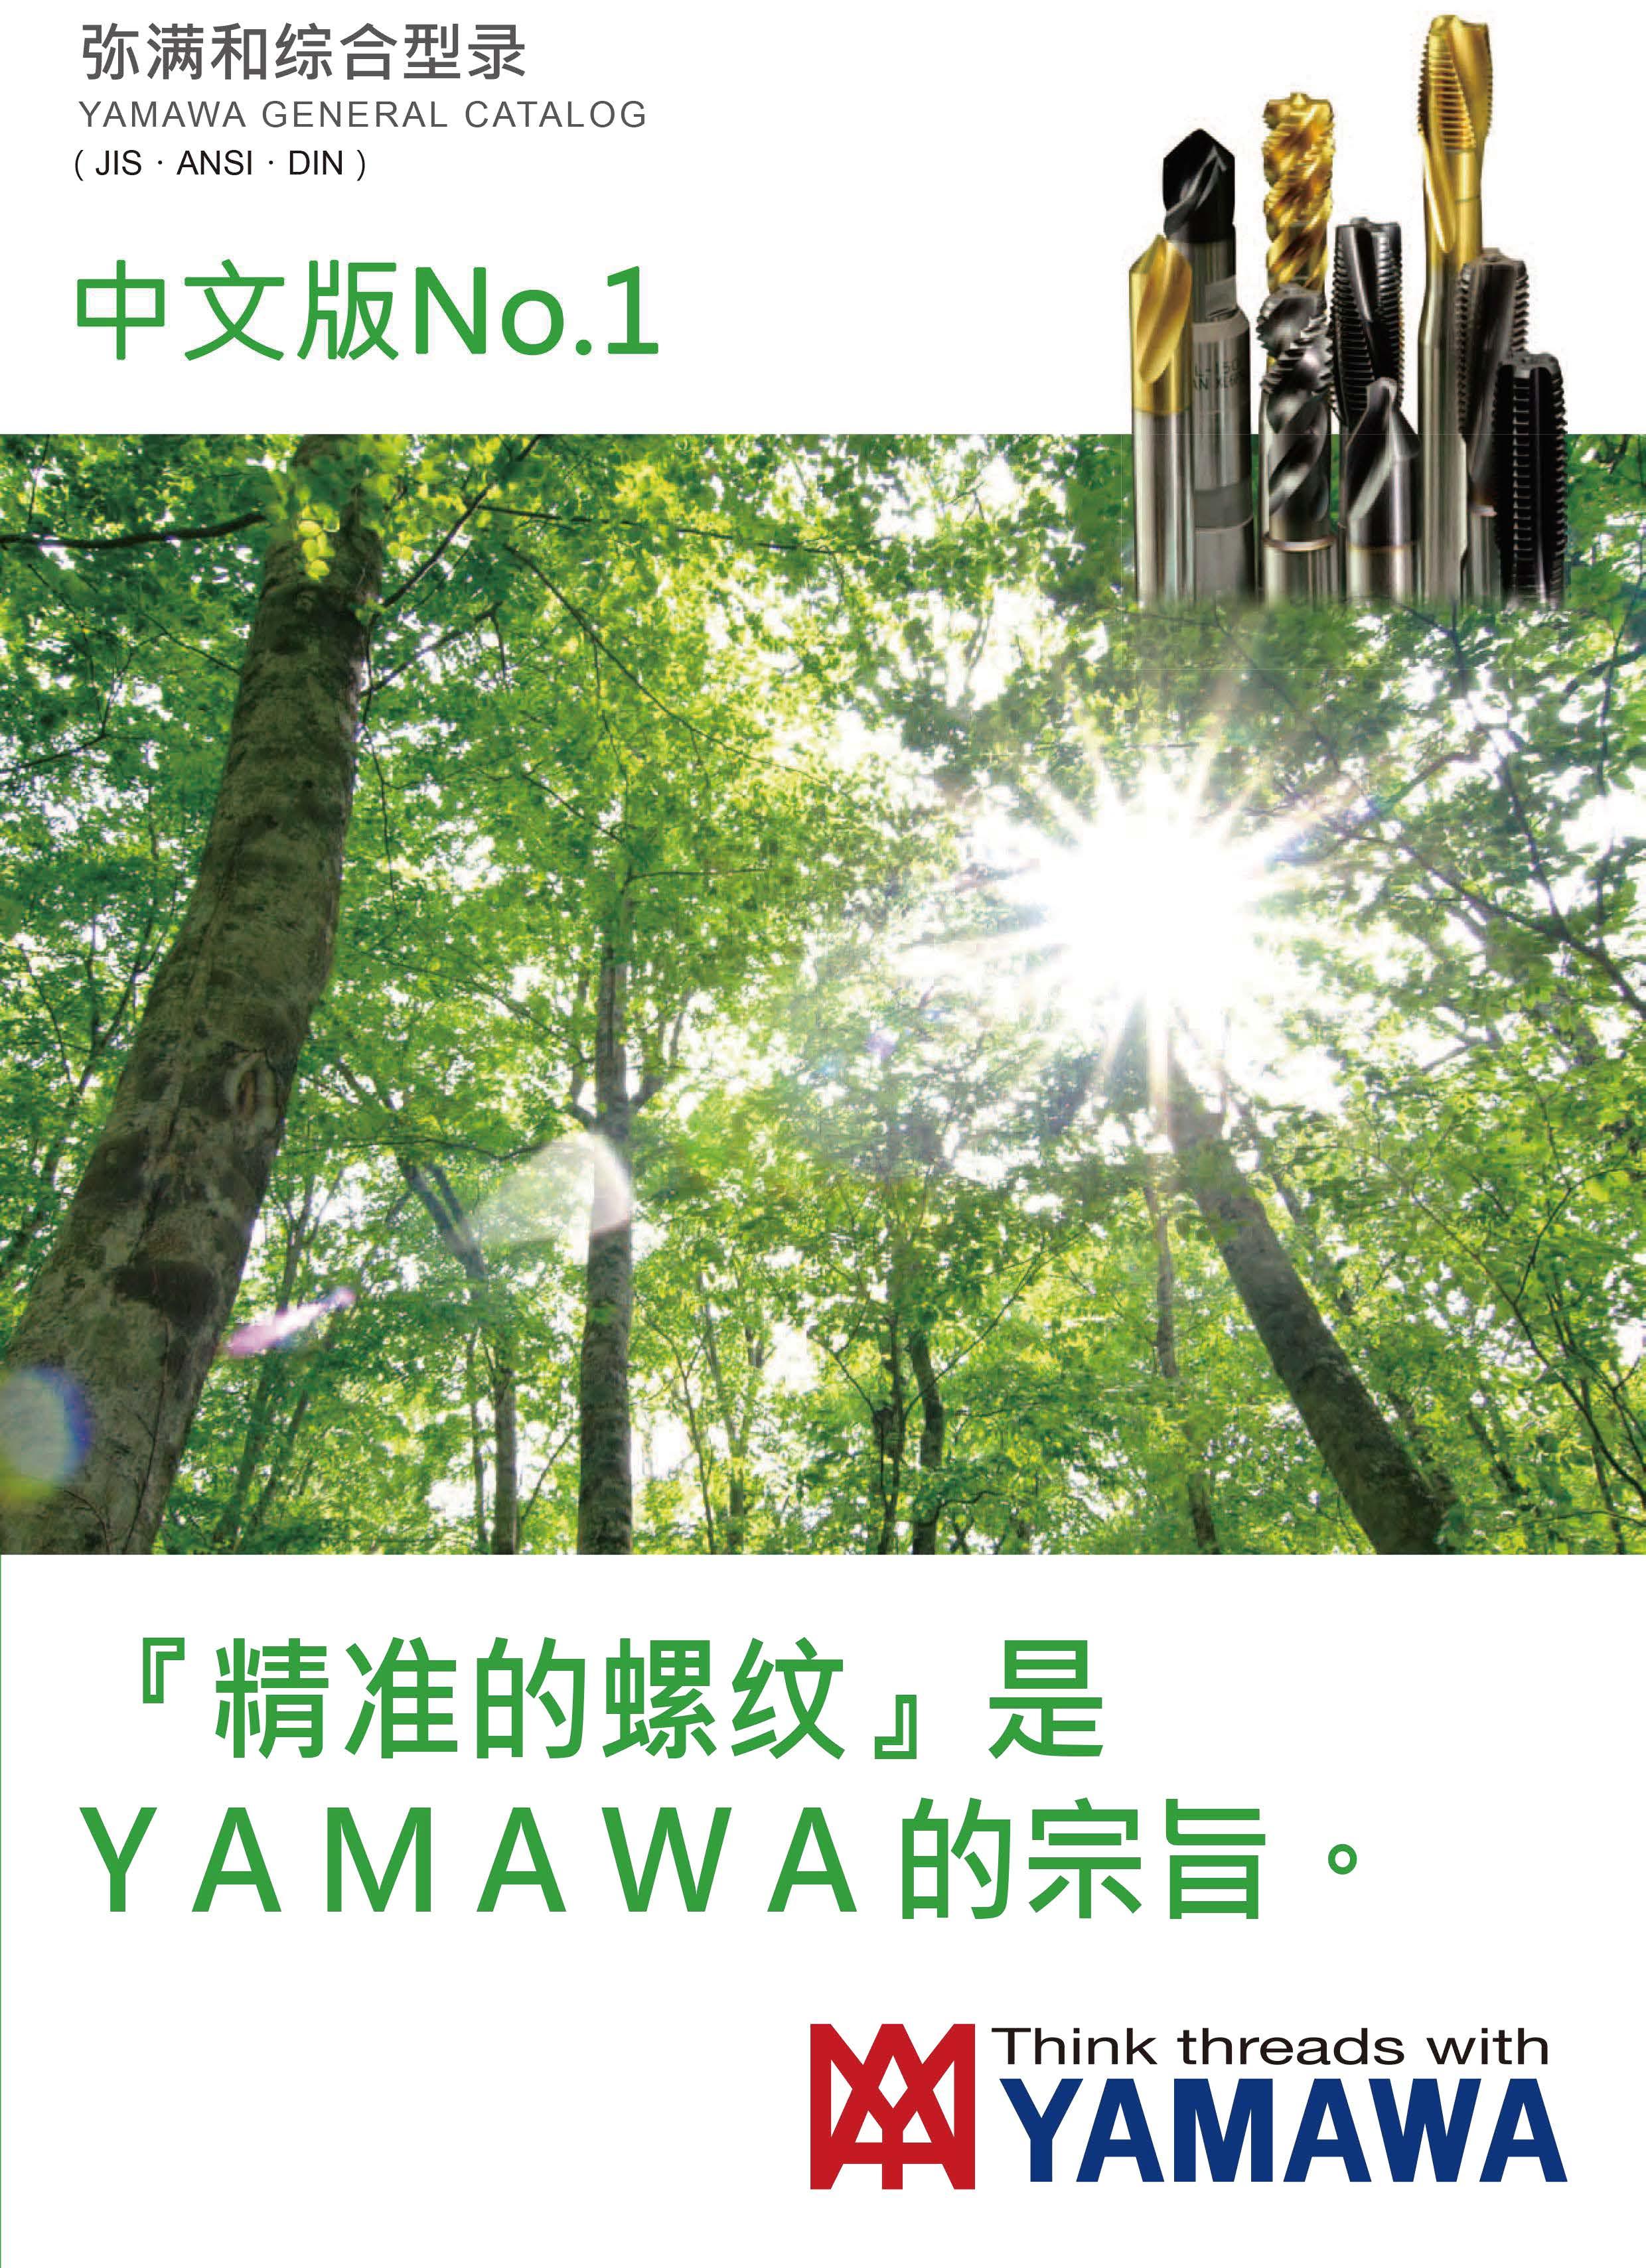 YAMAWA綜合型錄-中文版No.1